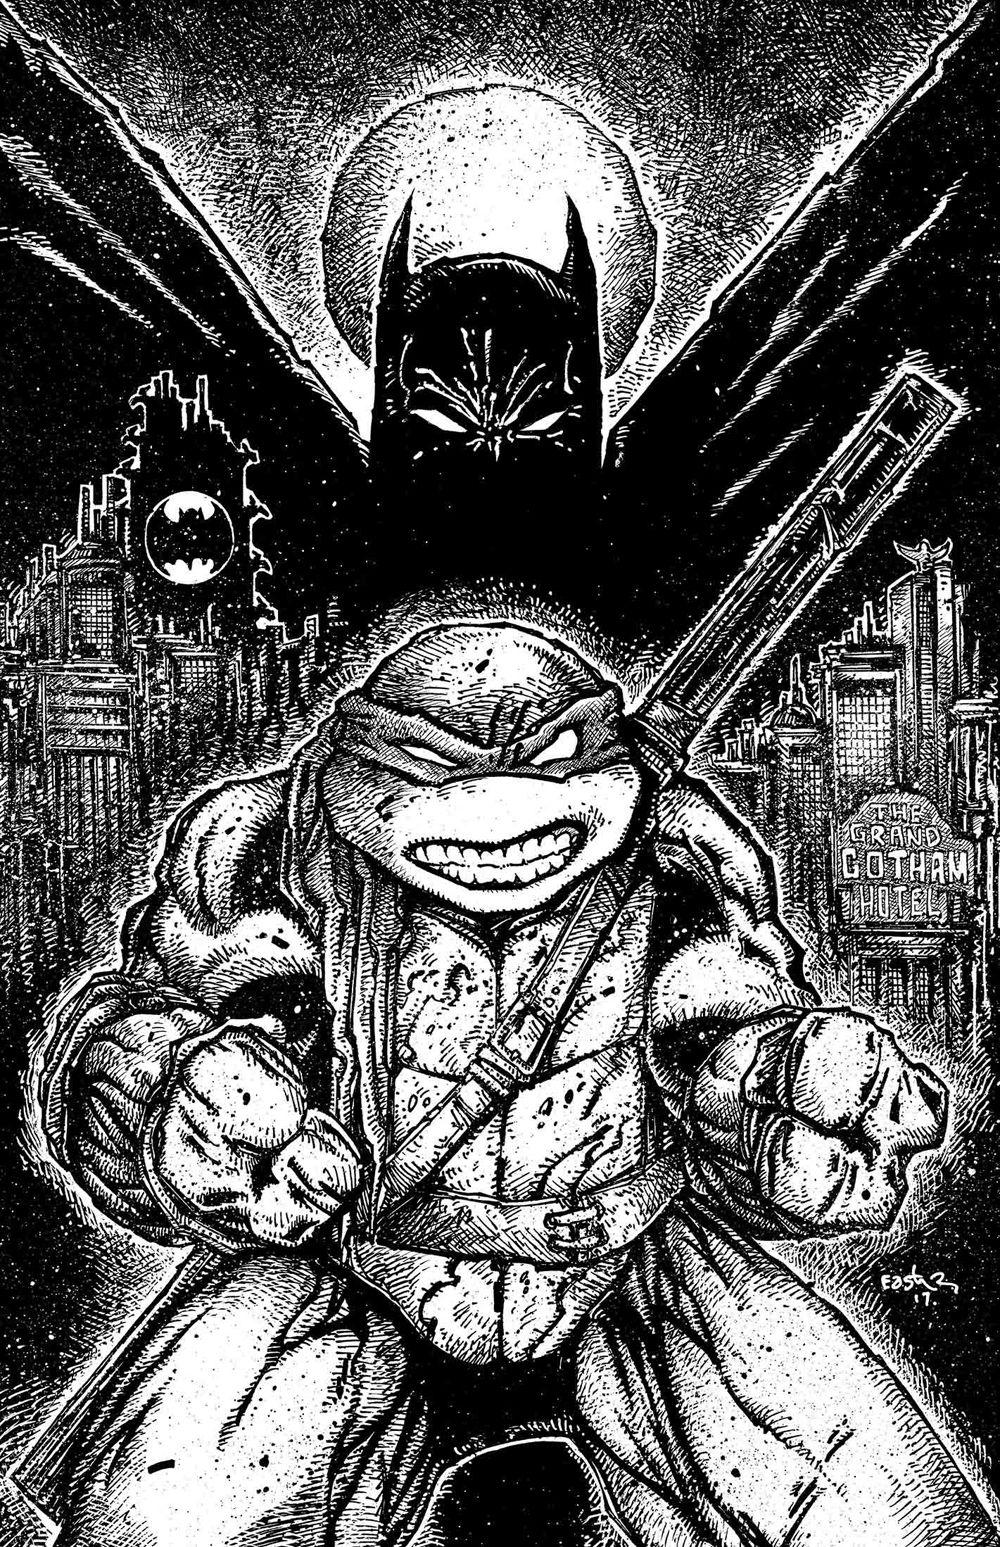 Batman Teenage Mutant Ninja Turtles Ii 2 By Kevin Eastman Ninja Turtles Teenage Mutant Ninja Turtles Art Ninja Turtles Art